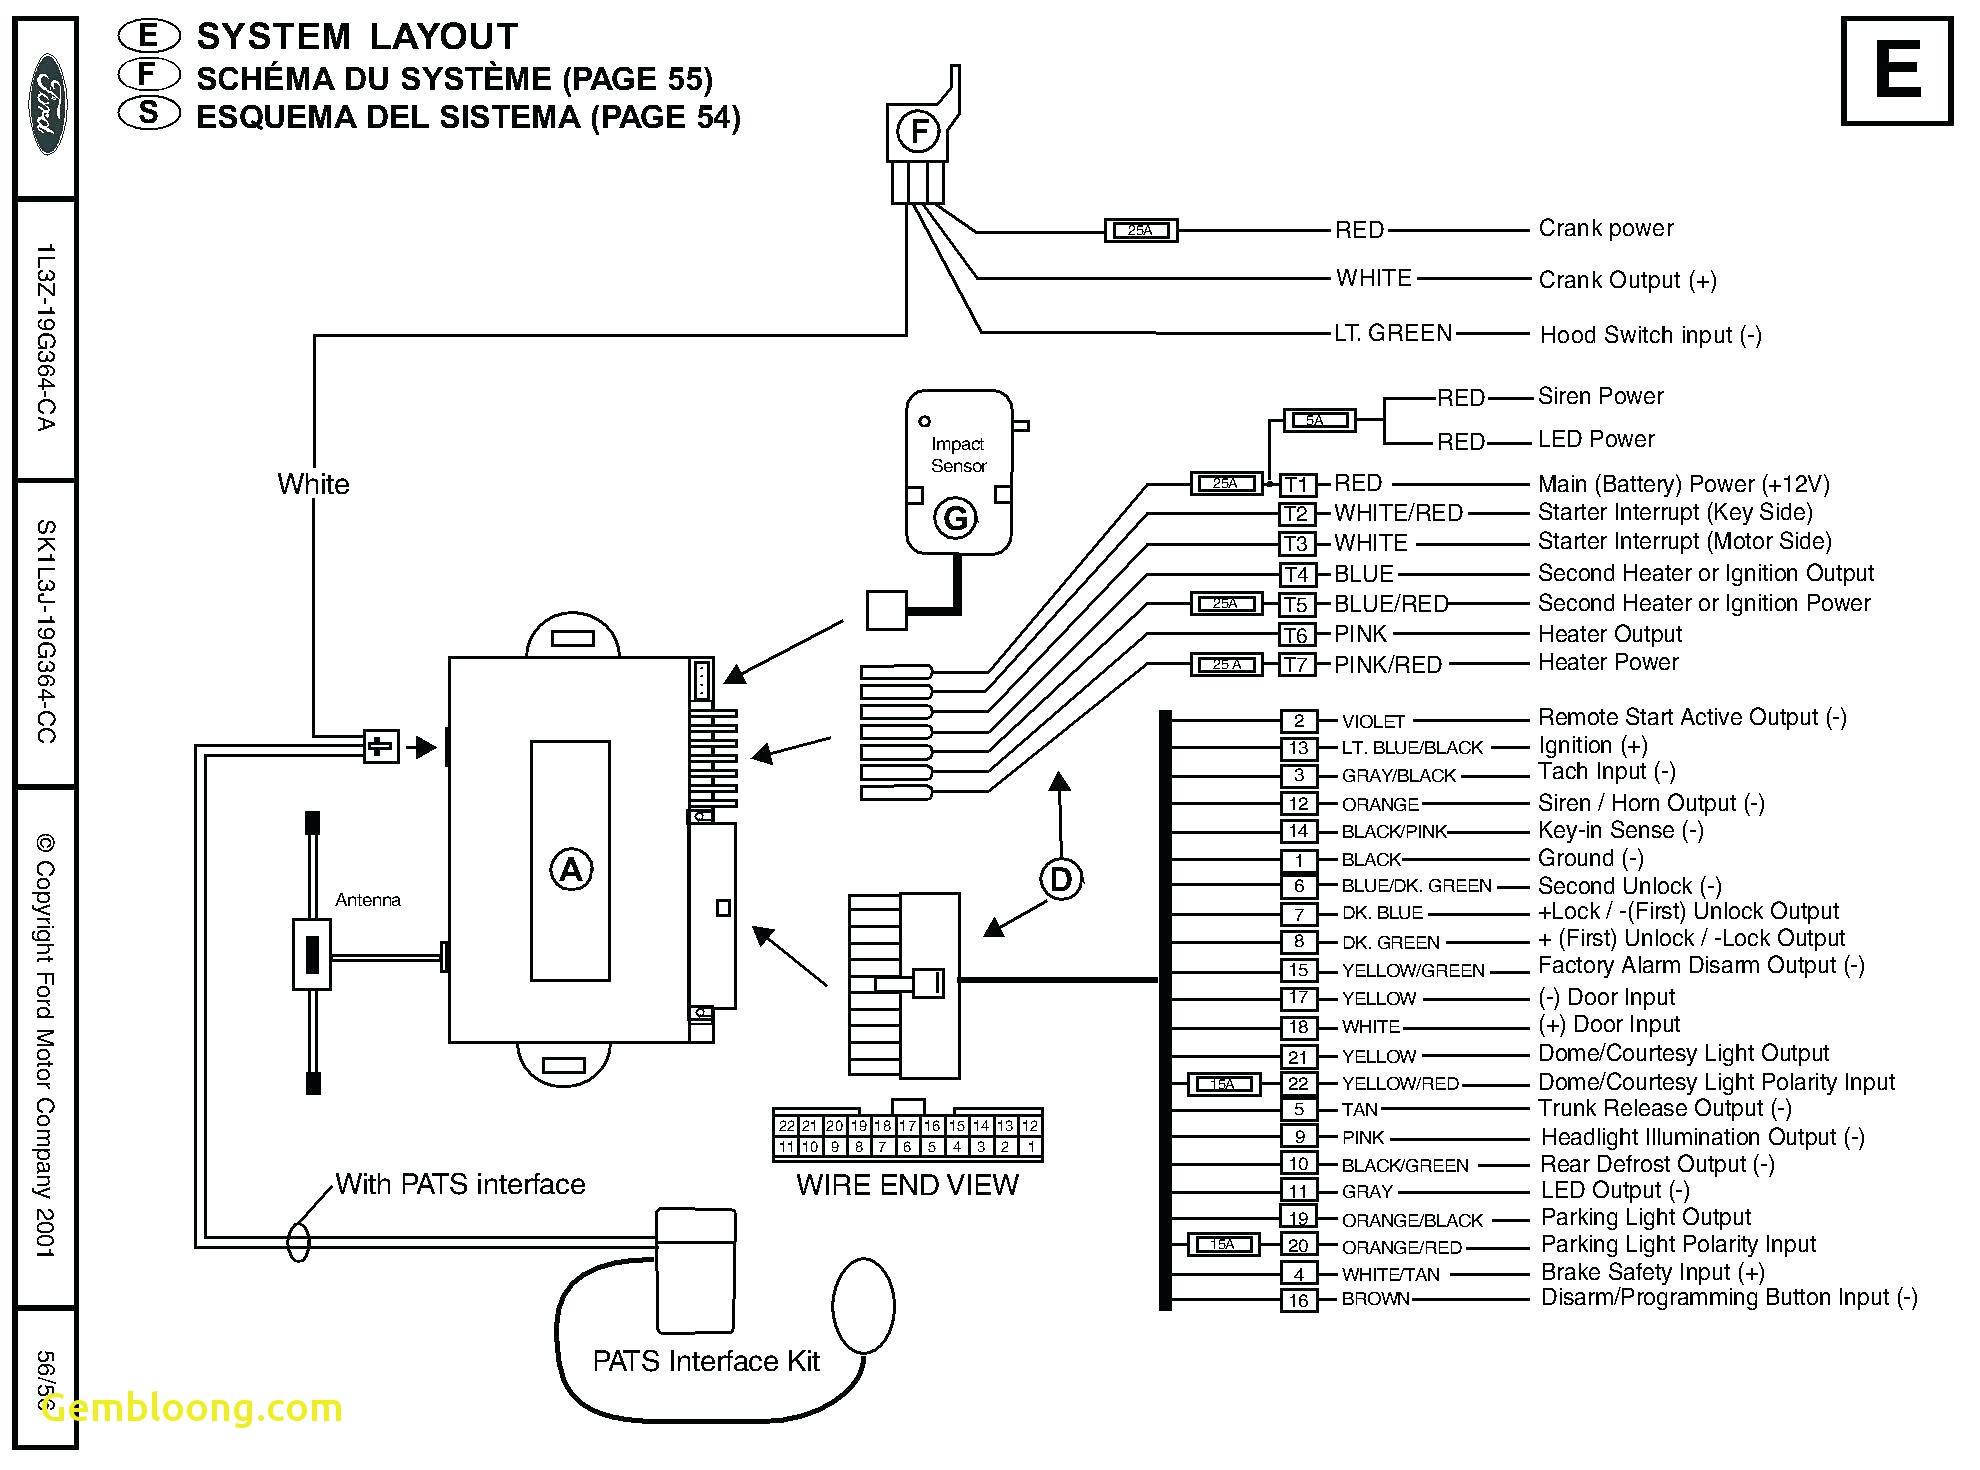 hight resolution of valet 561r wiring diagram 19 18 depo aqua de u2022ready remote wiring diagram expedition 12 depo aqua de u2022 rh 12 depo aqua de valet remote starter